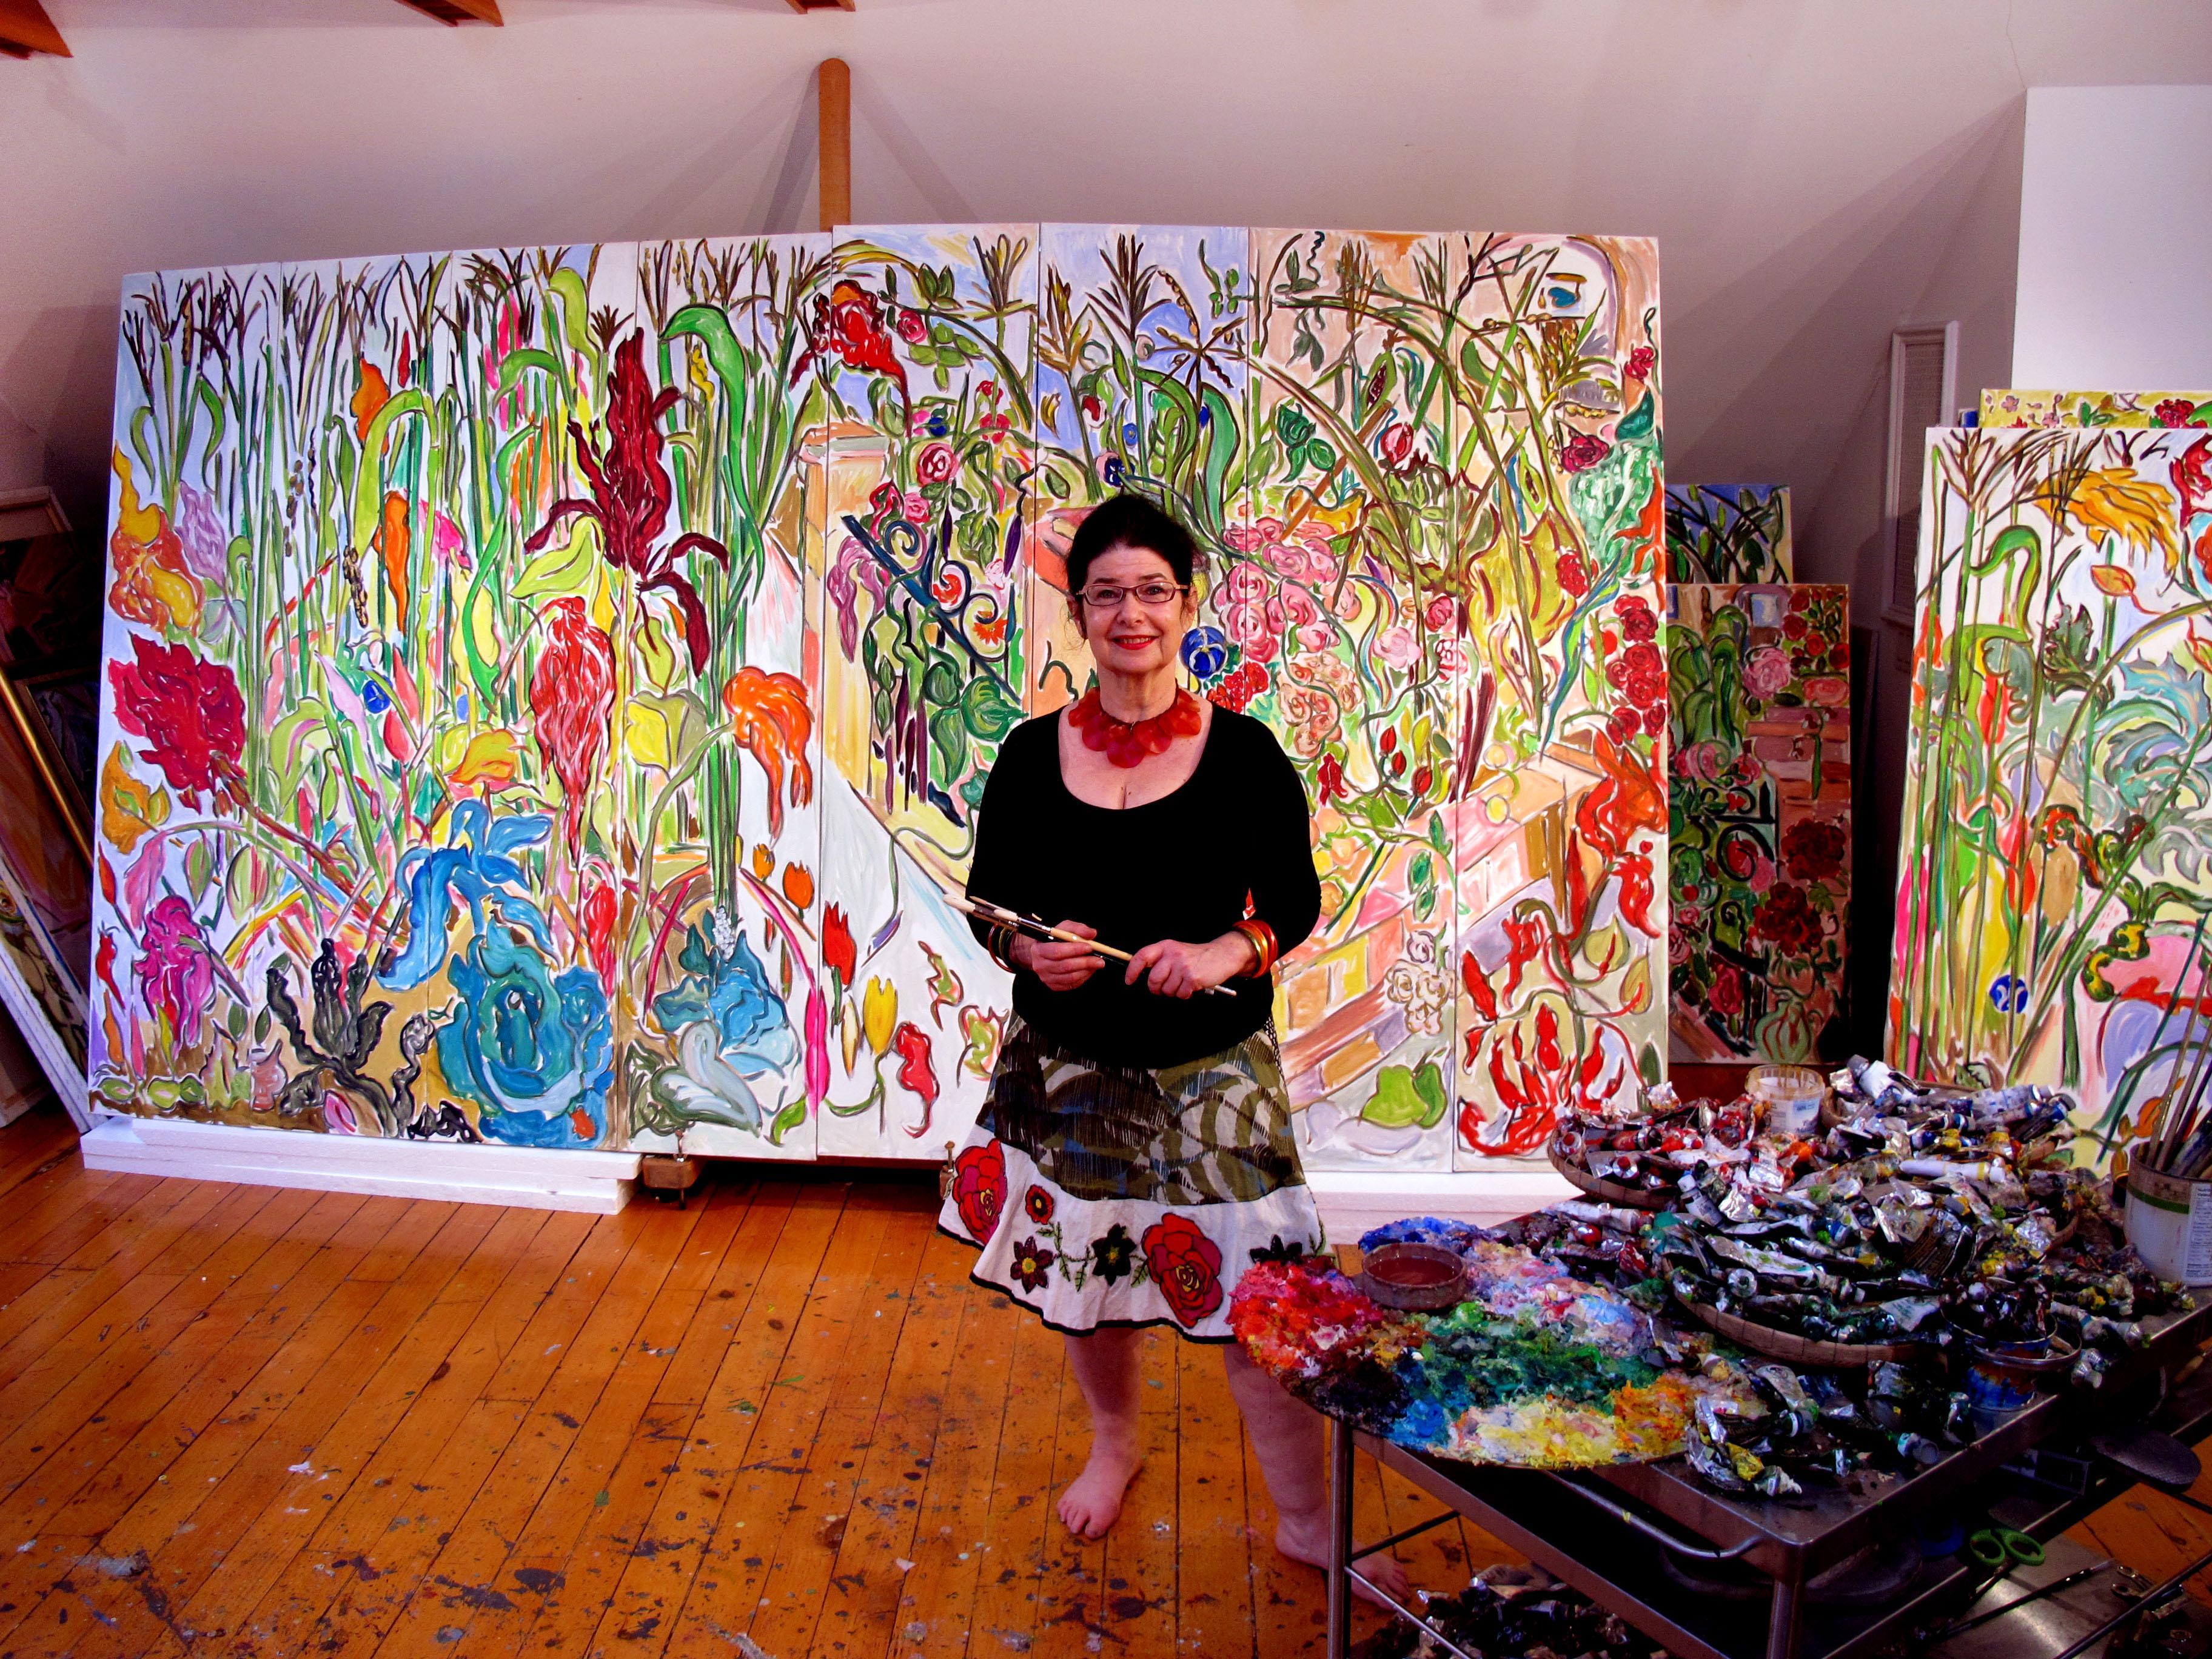 Inter Disciplinary Artist Vivian Reiss Is Showing Her